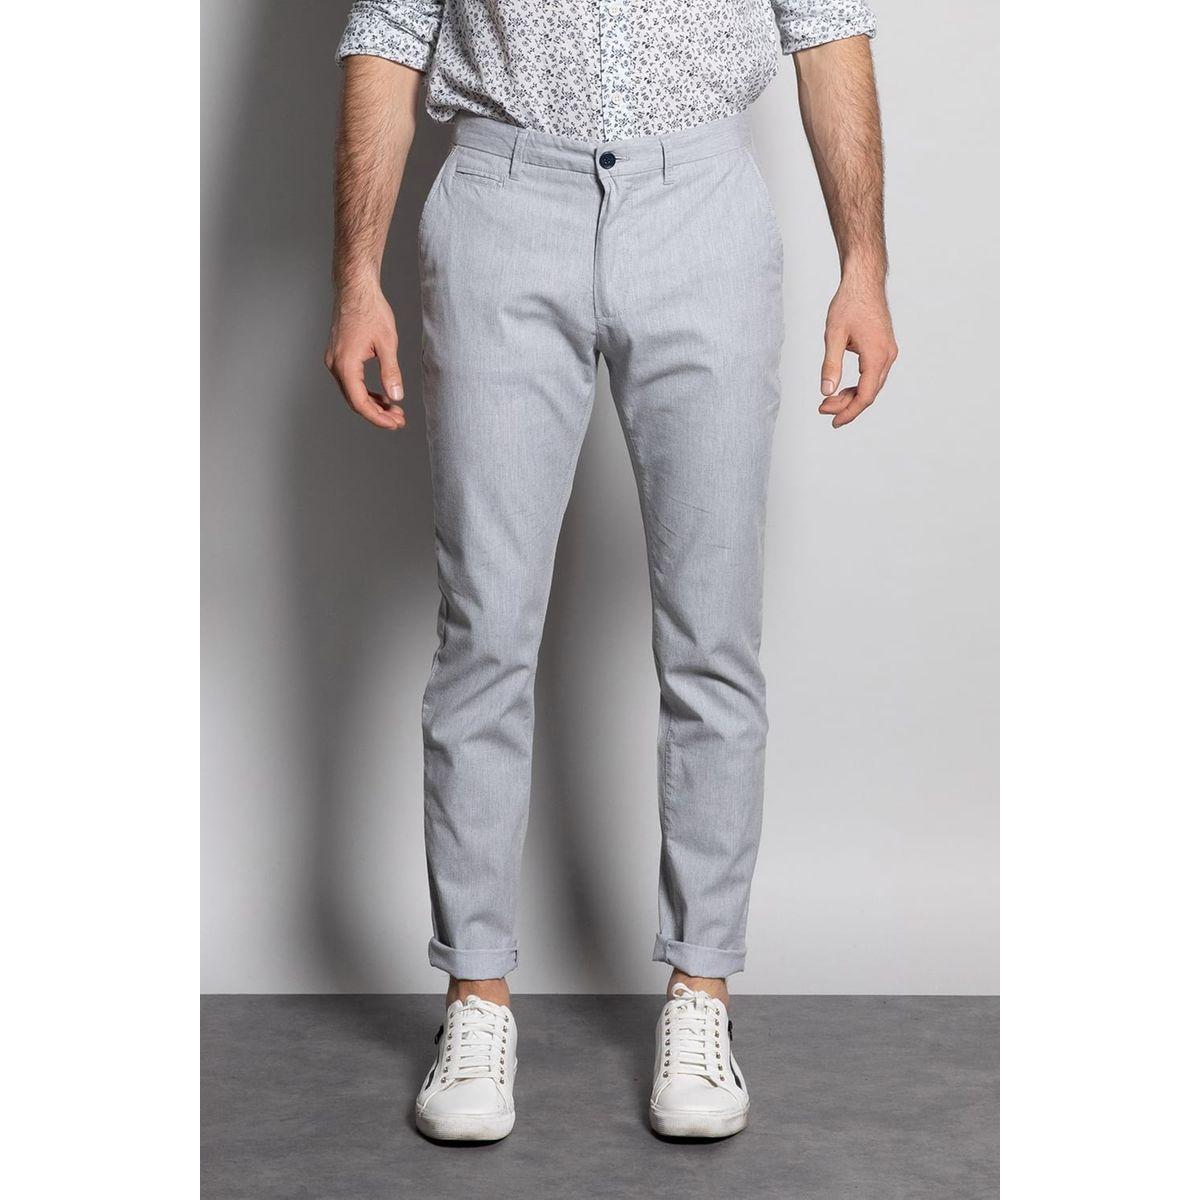 Pantalon chino slim GULLSON